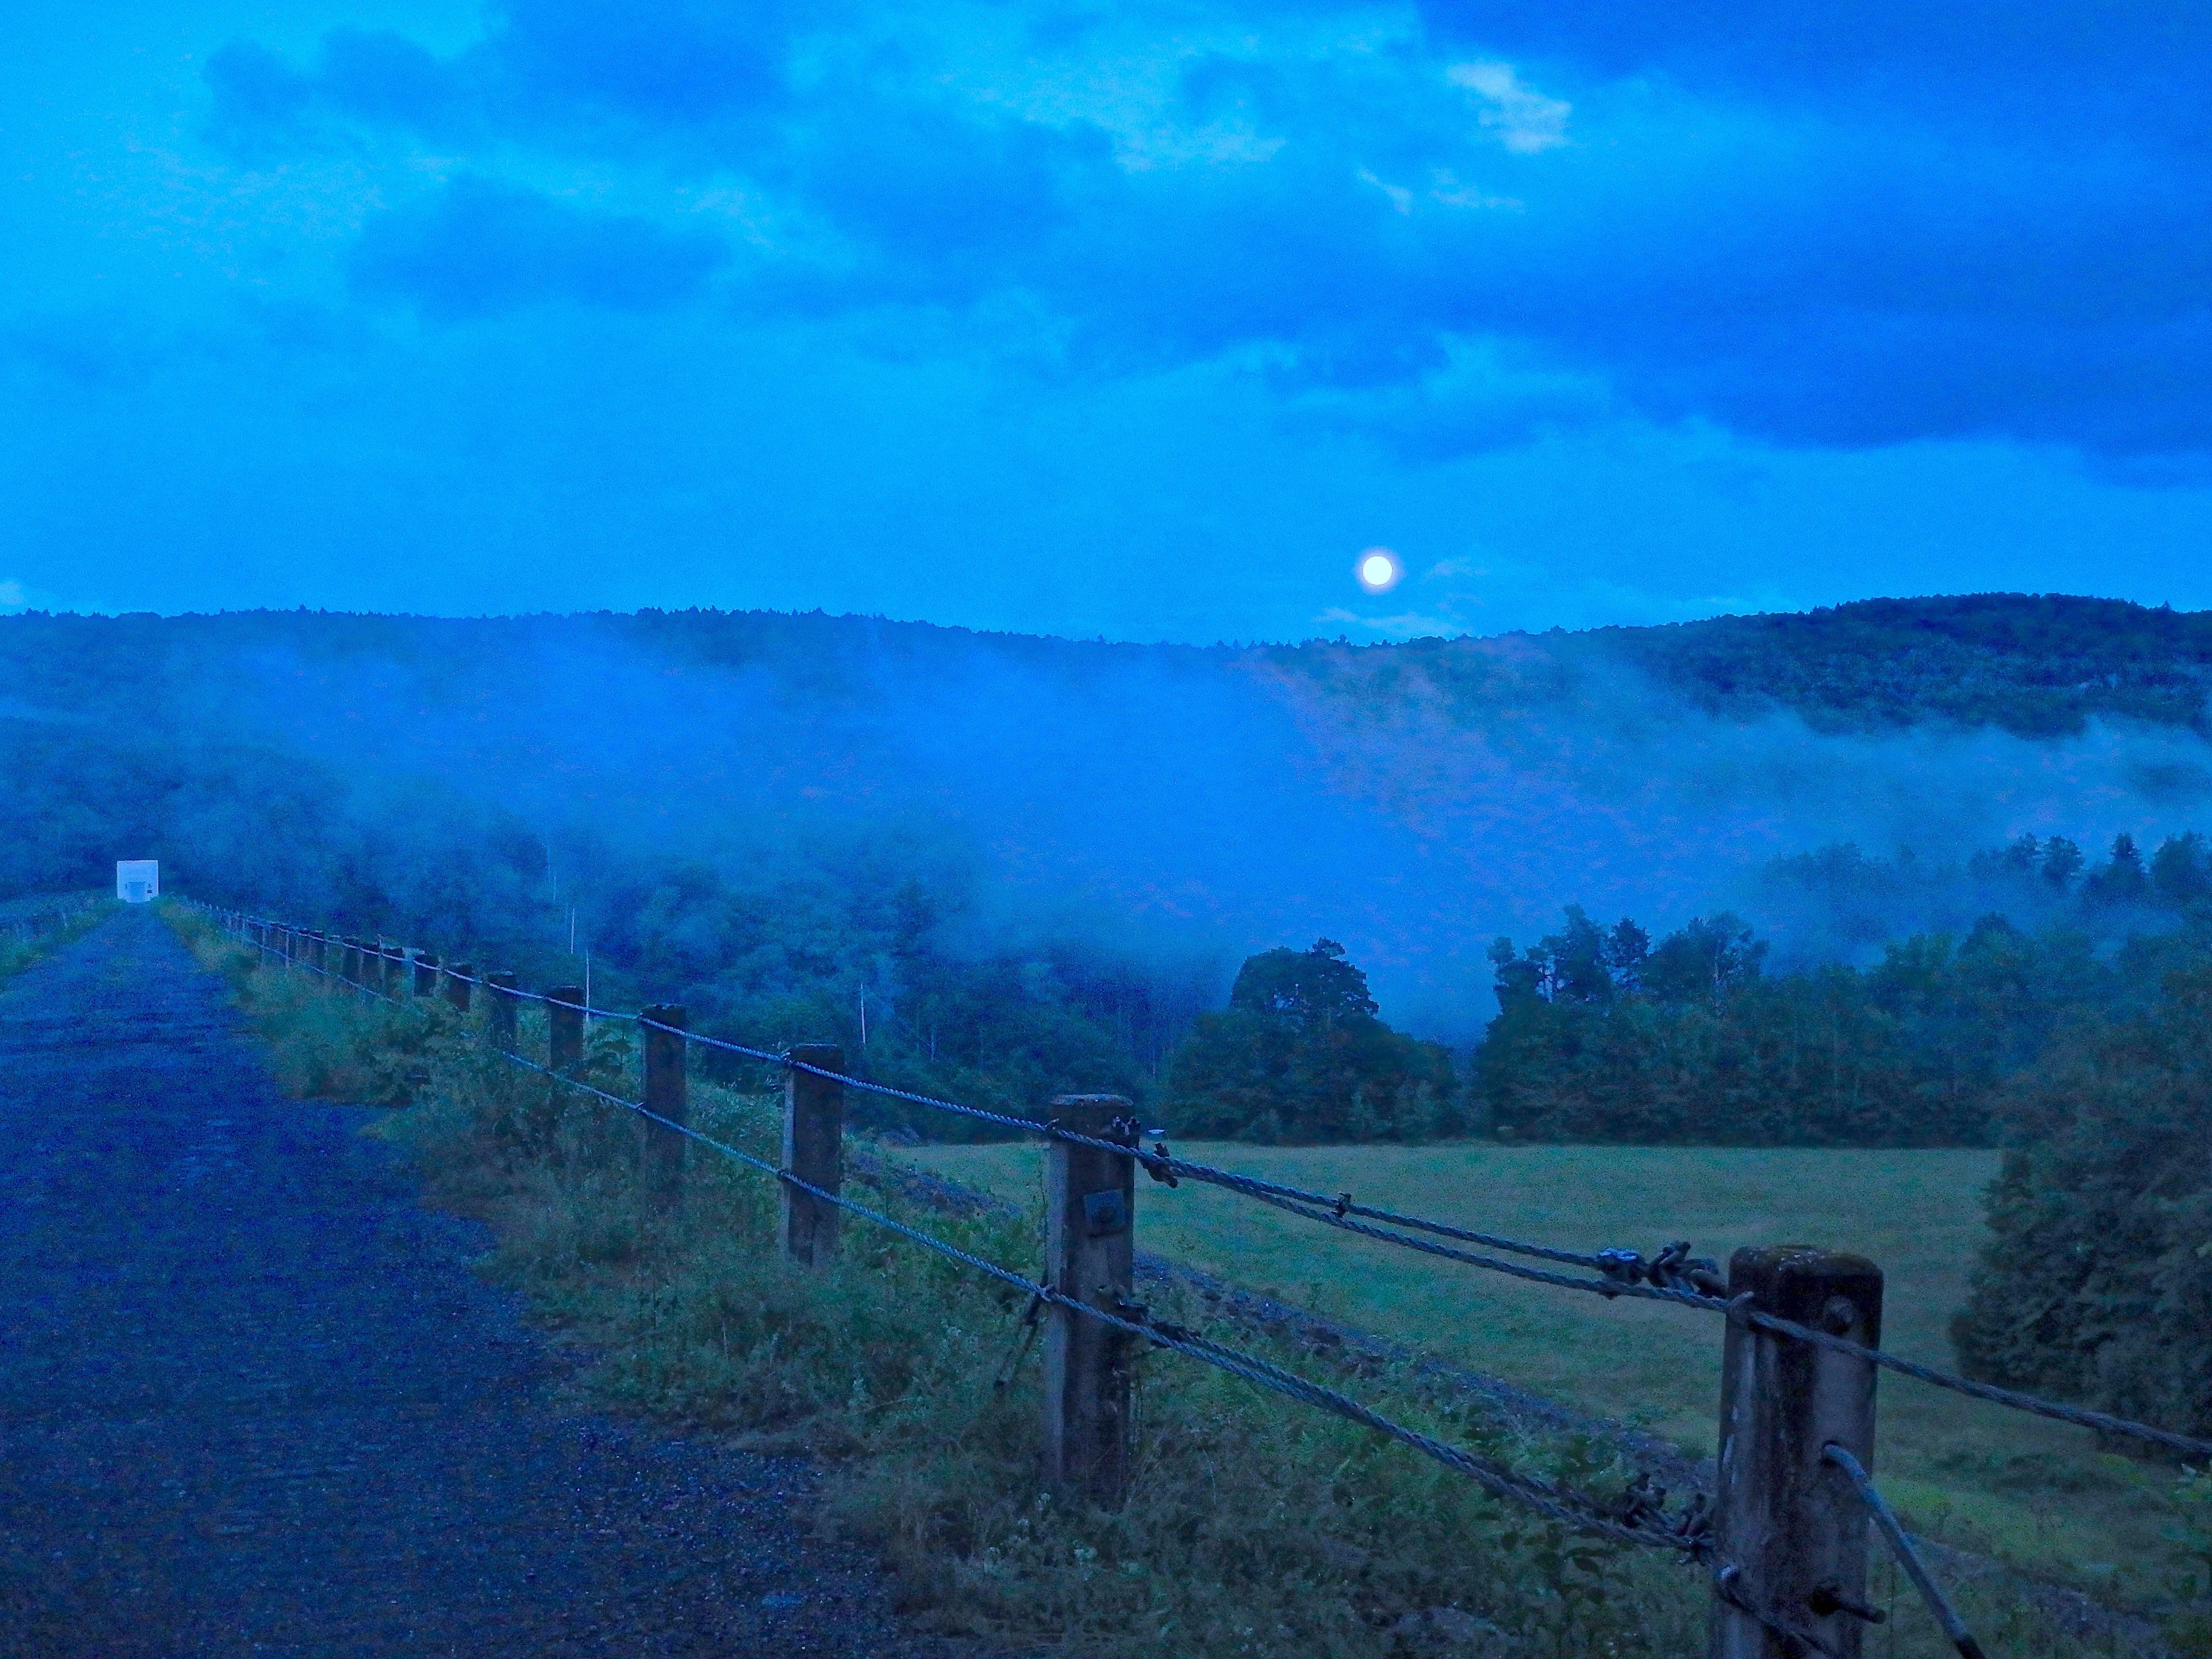 170708_moonrise_over_waterbury_dam_adjusted_1_small